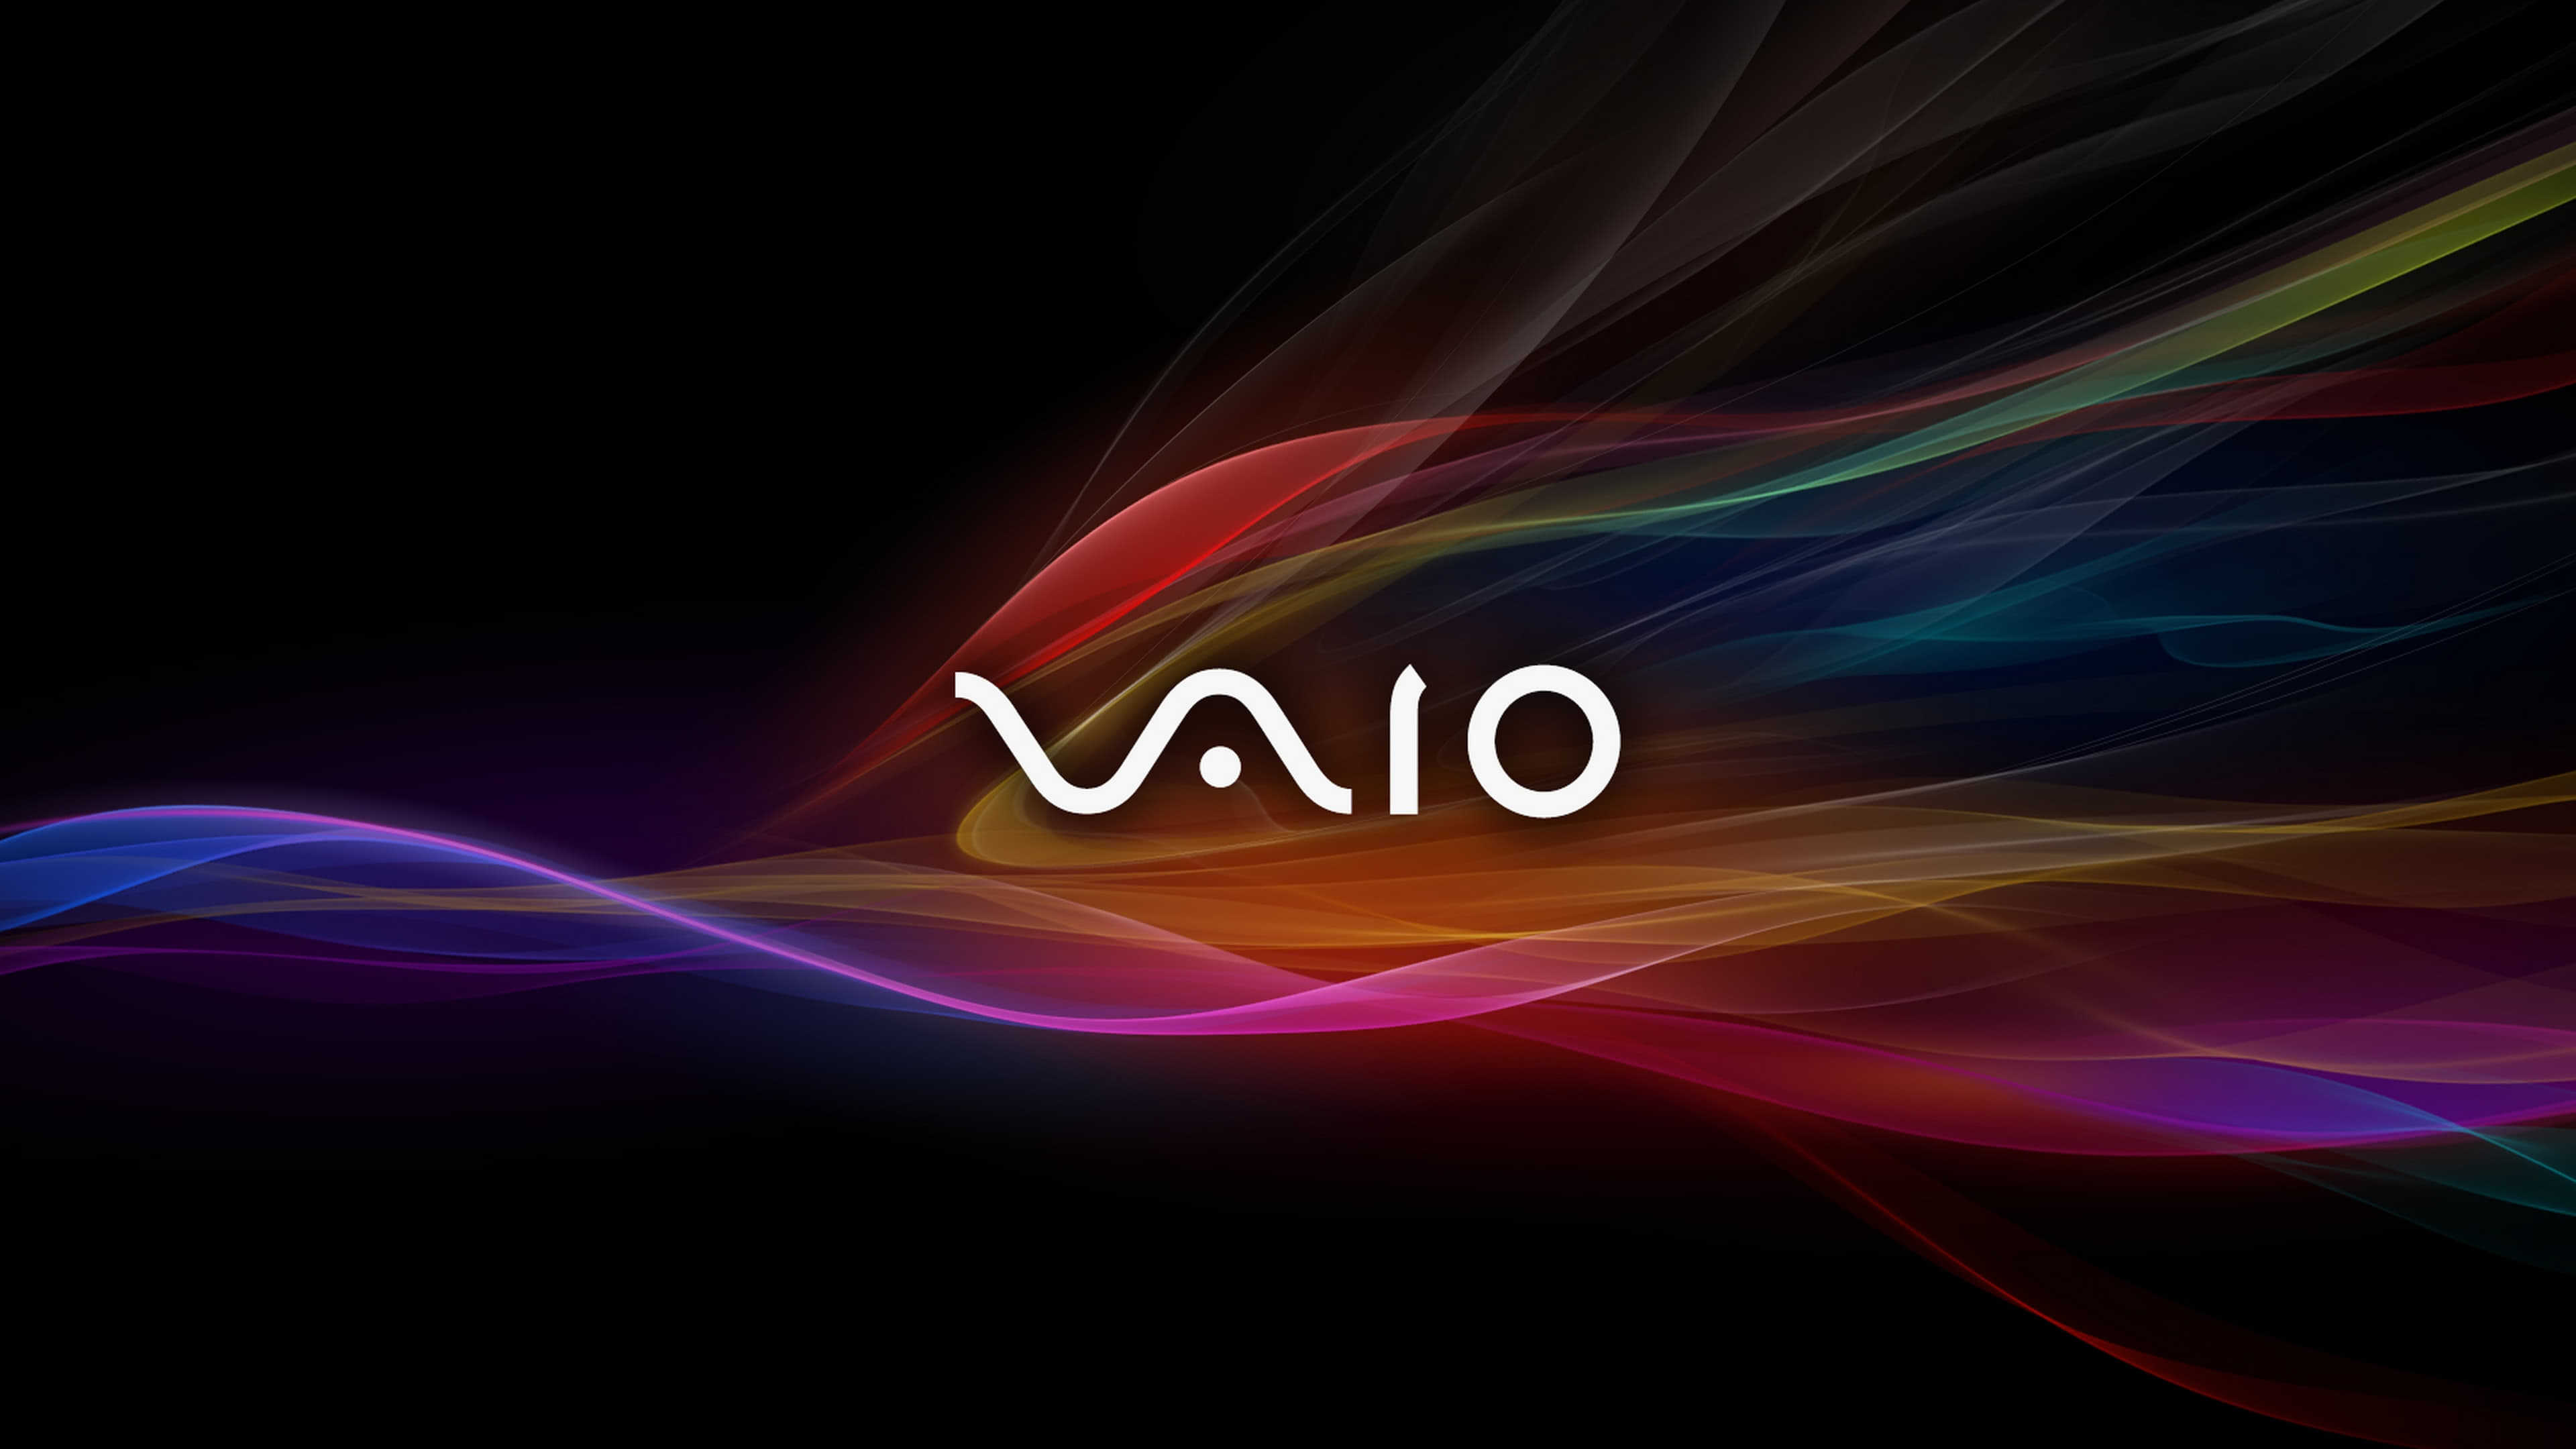 Sony vaio logo wallpapers top free sony vaio logo backgrounds wallpaperaccess - Sony vaio wallpaper 1280x800 ...